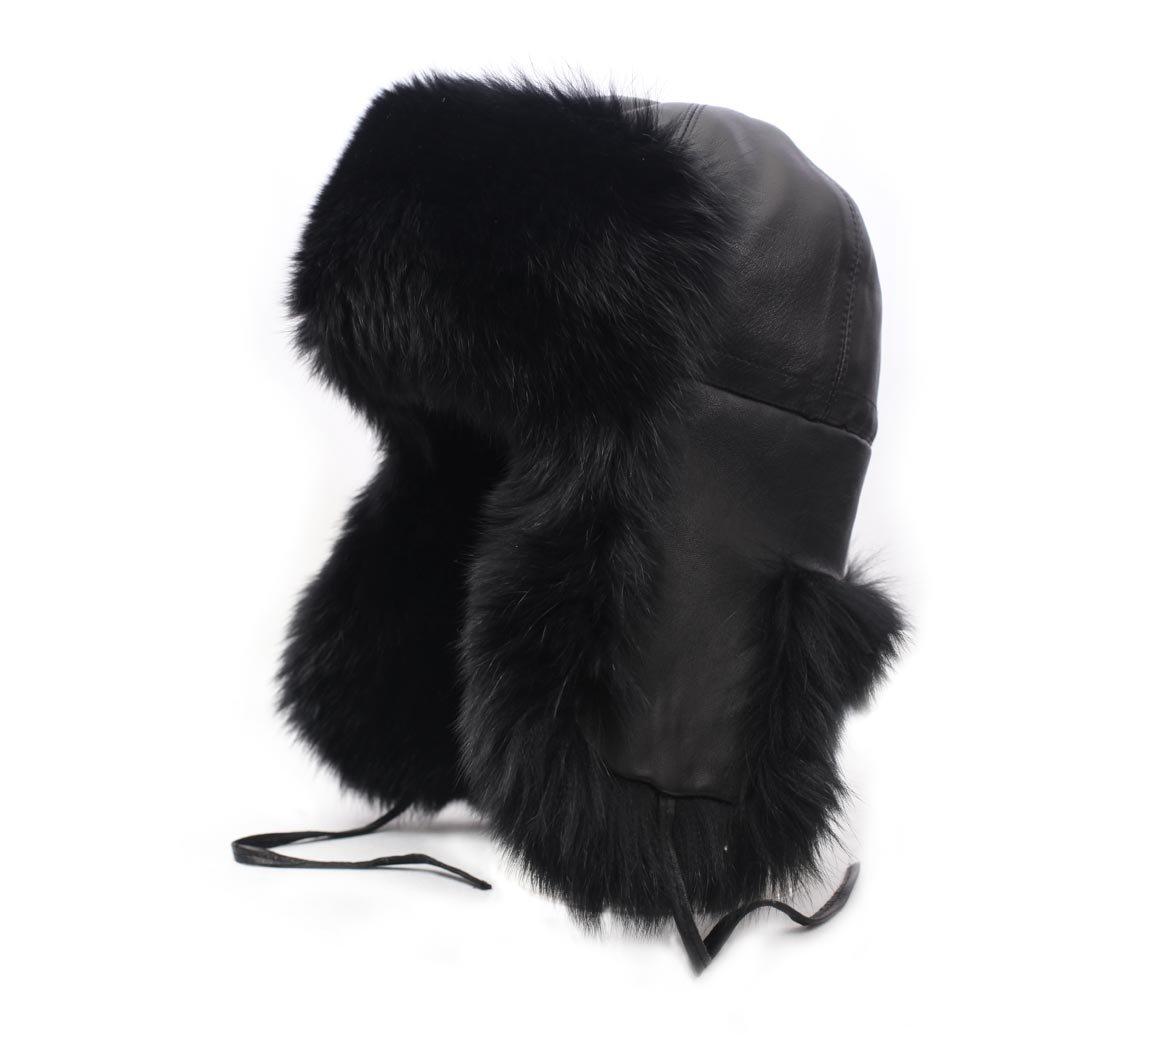 Karibu Women's Bertrina Leather Trapper Hat Size 54 cm by Karibu